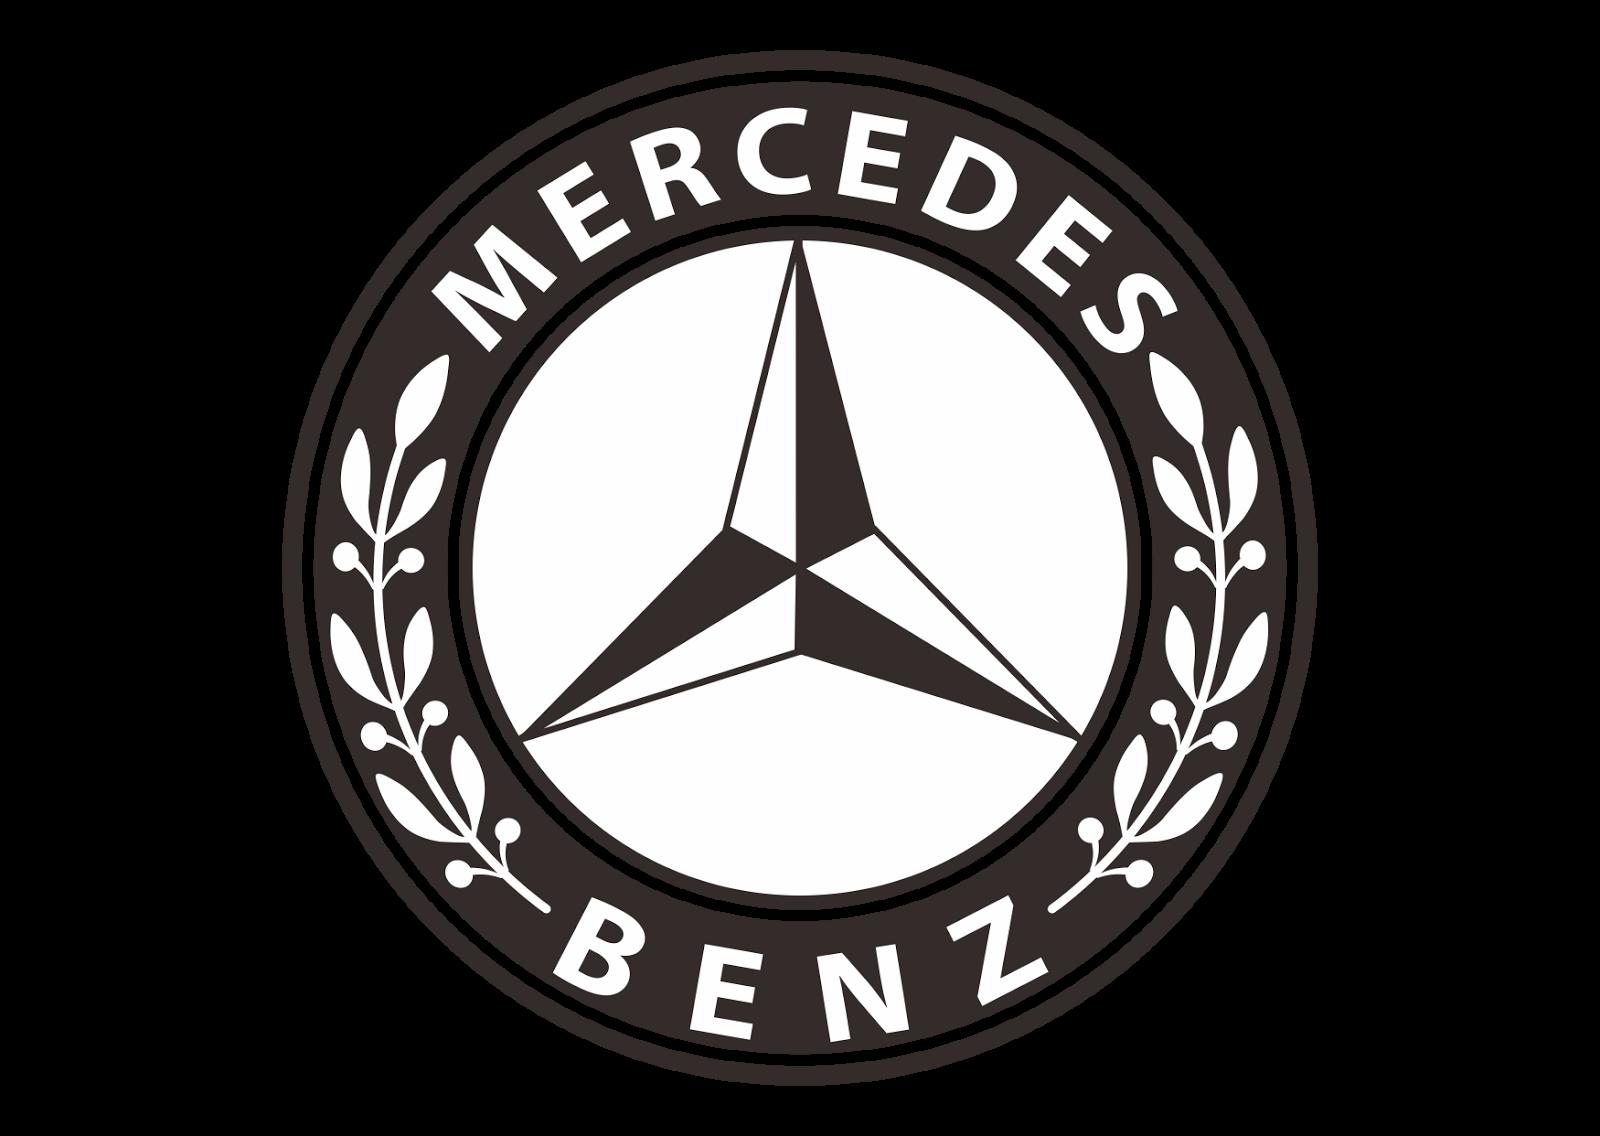 Mercedes Benz Logo Vector Design Part 2 Format Cdr Ai Eps Svg Pdf Png Konsep Mobil Mobil Burung Elang